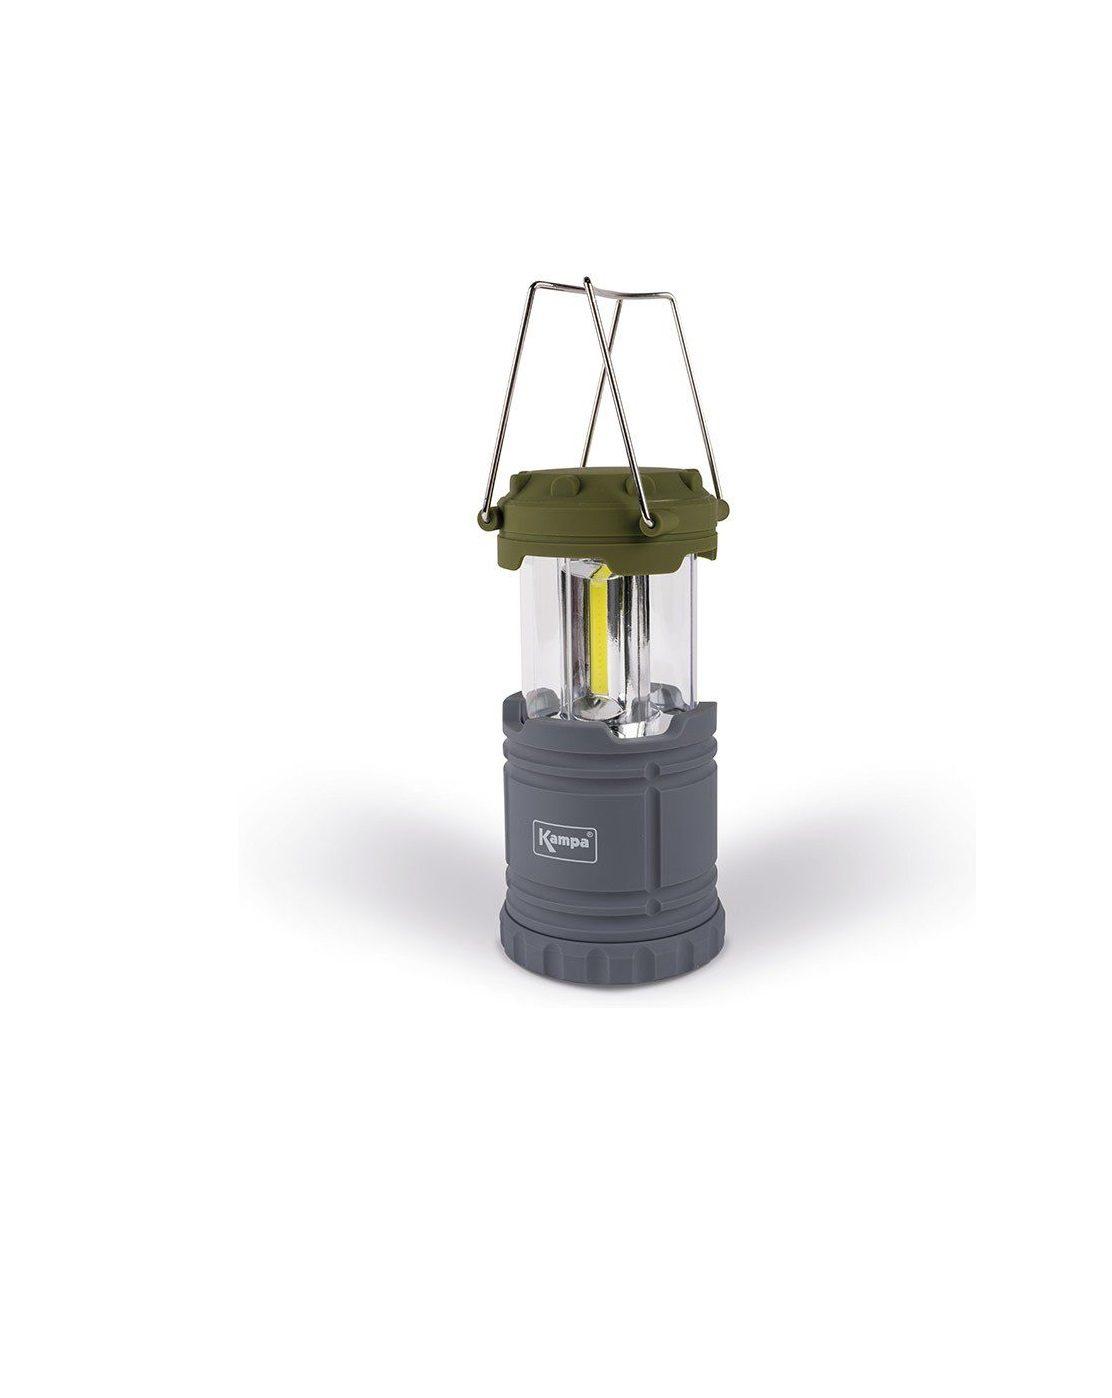 601068 Kampa Flare Cob Led Lantern 1 1530152339